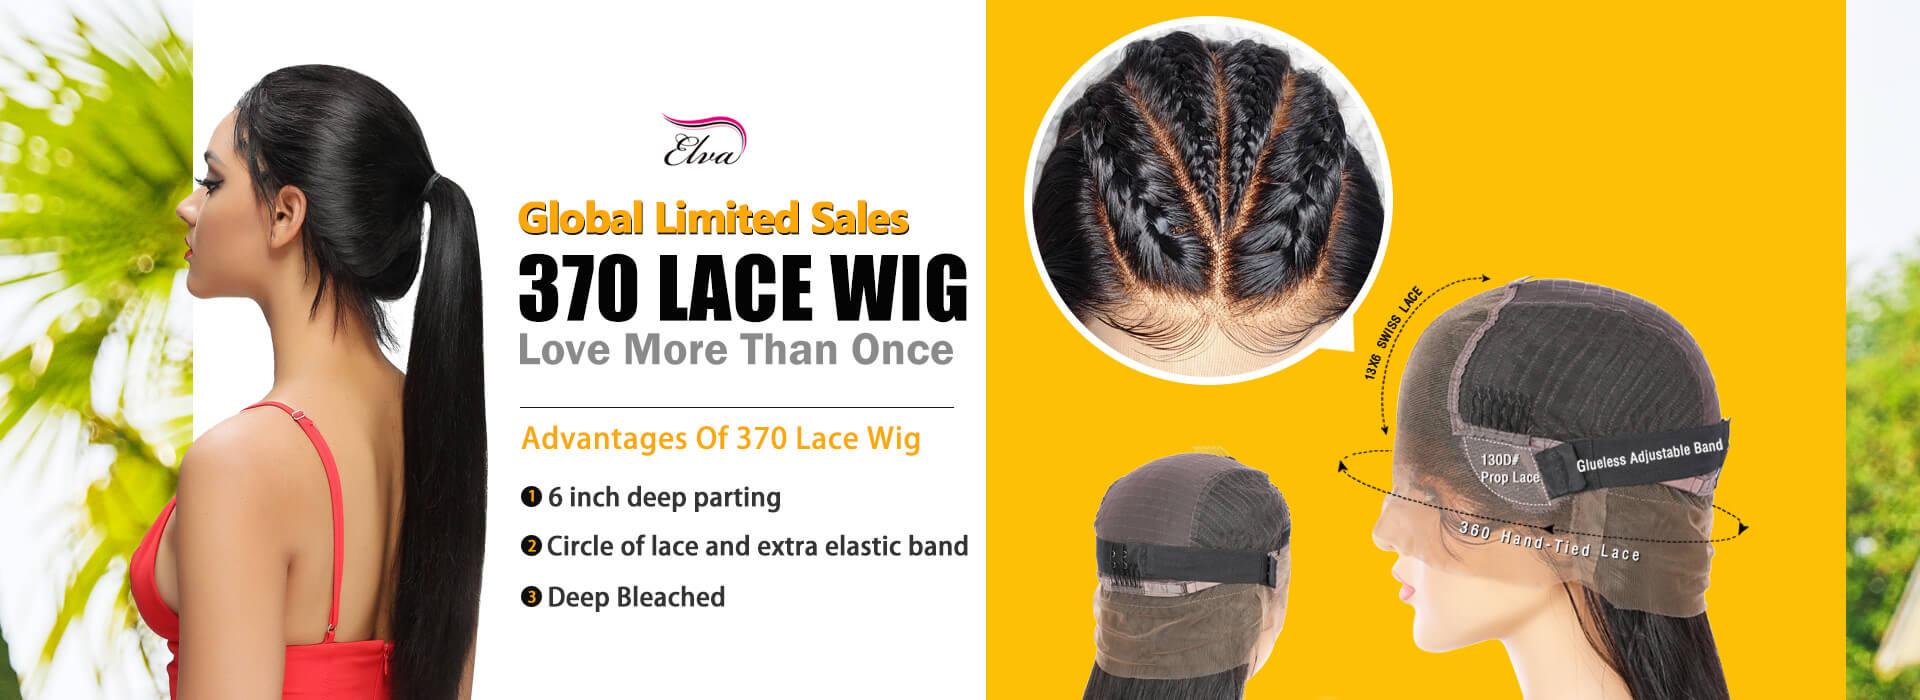 370 Lace Wigs